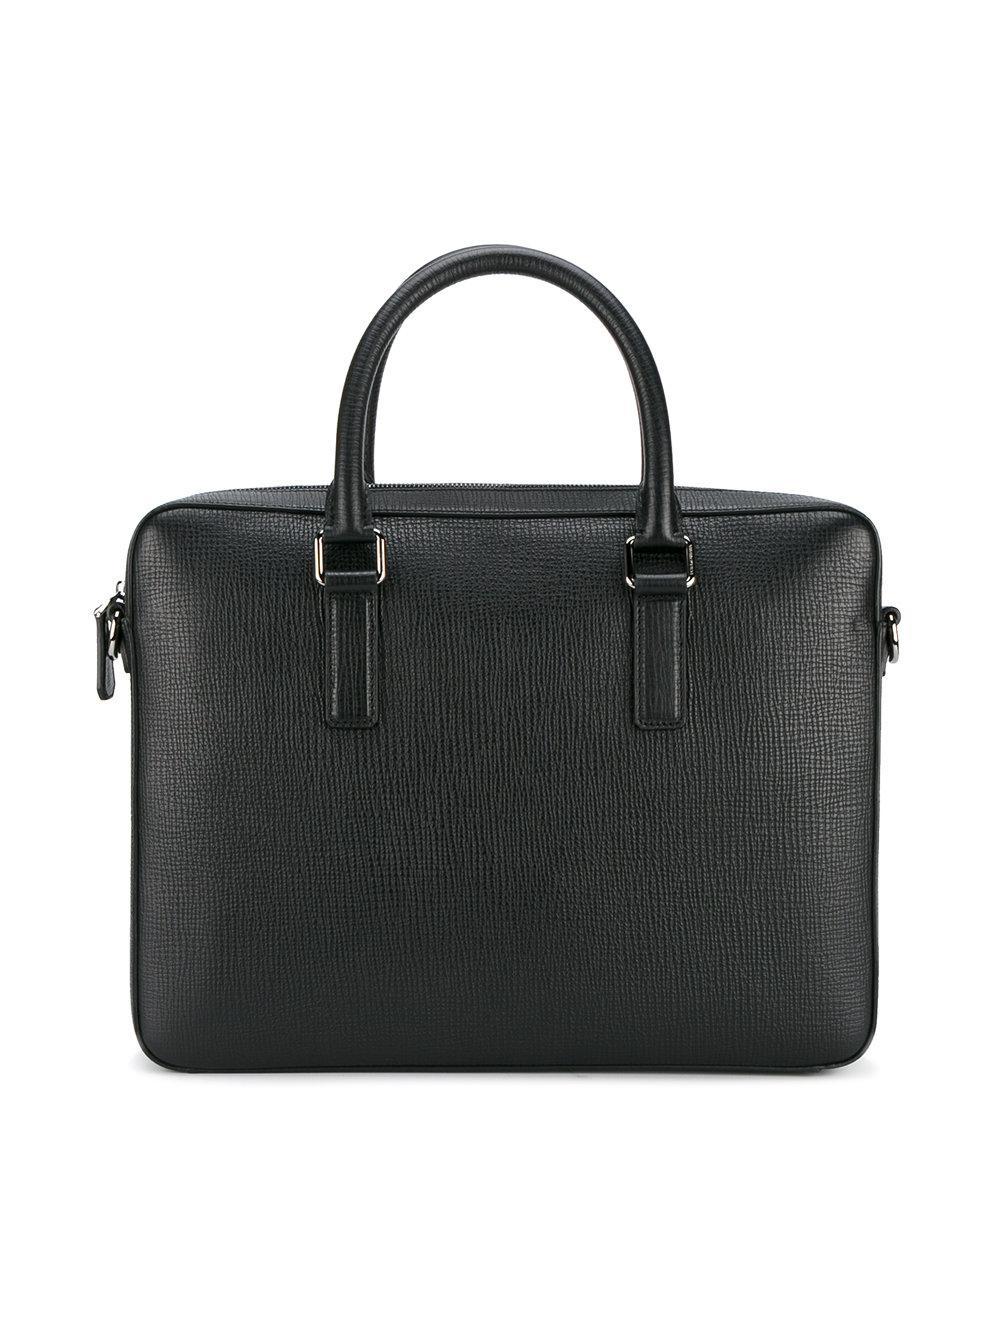 Dolce & Gabbana Leather Crossbody Laptop Bag in Black for Men